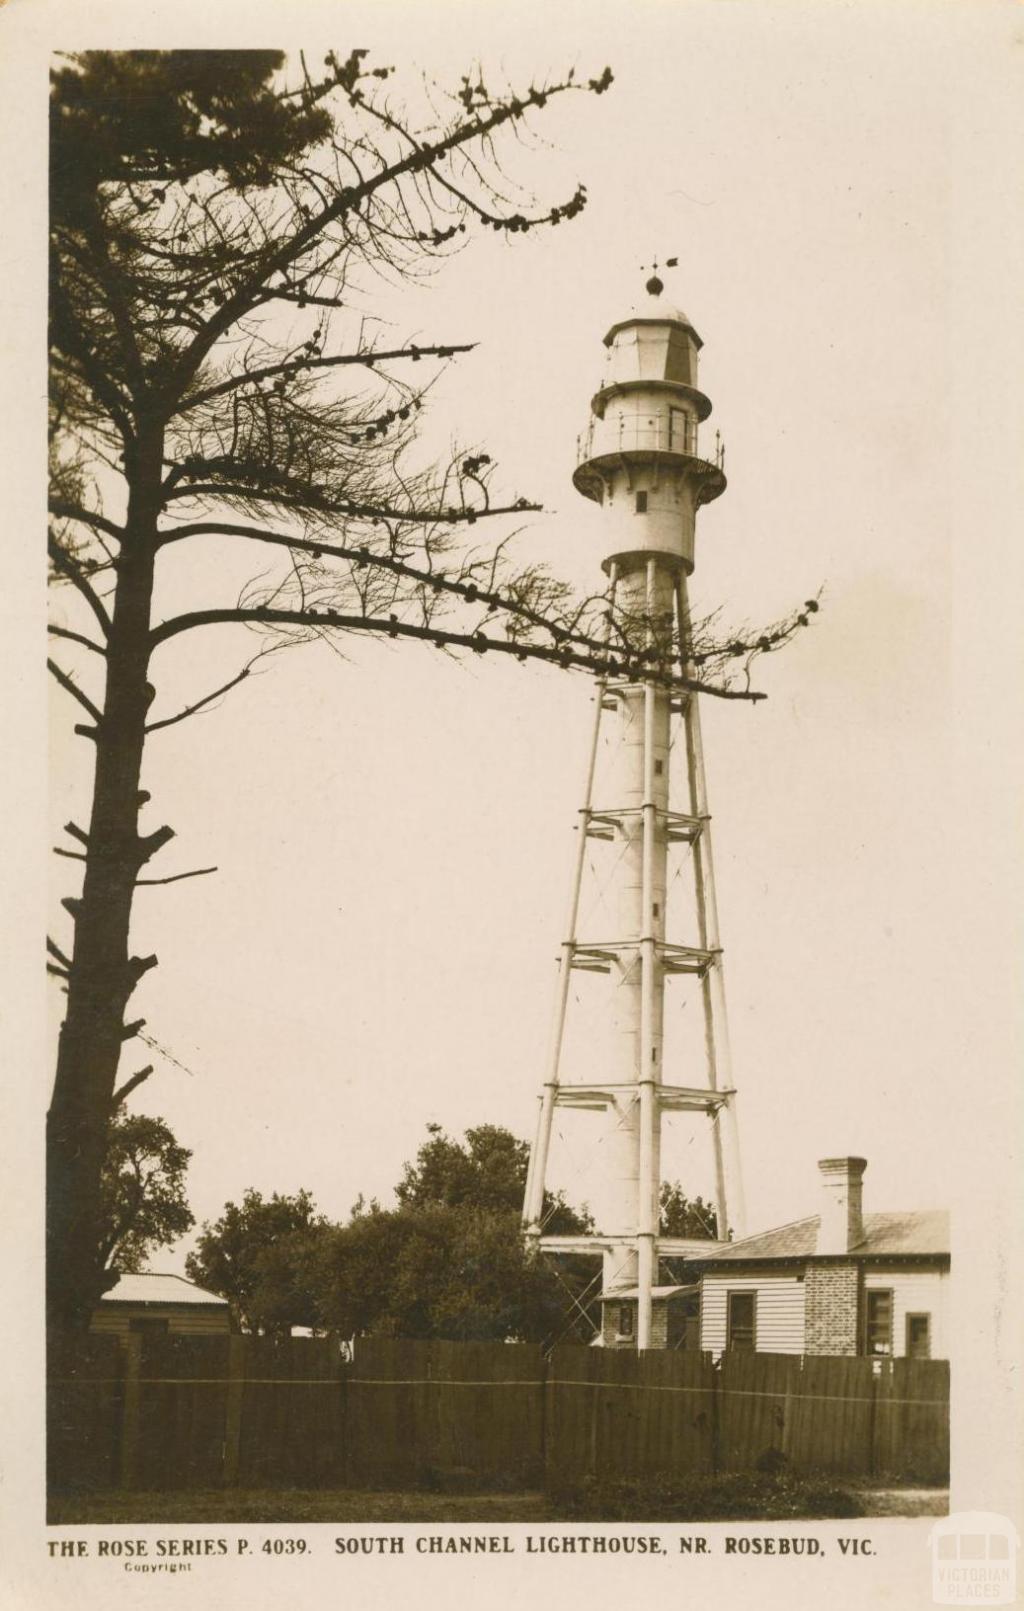 South Channel Lighthouse, near Rosebud